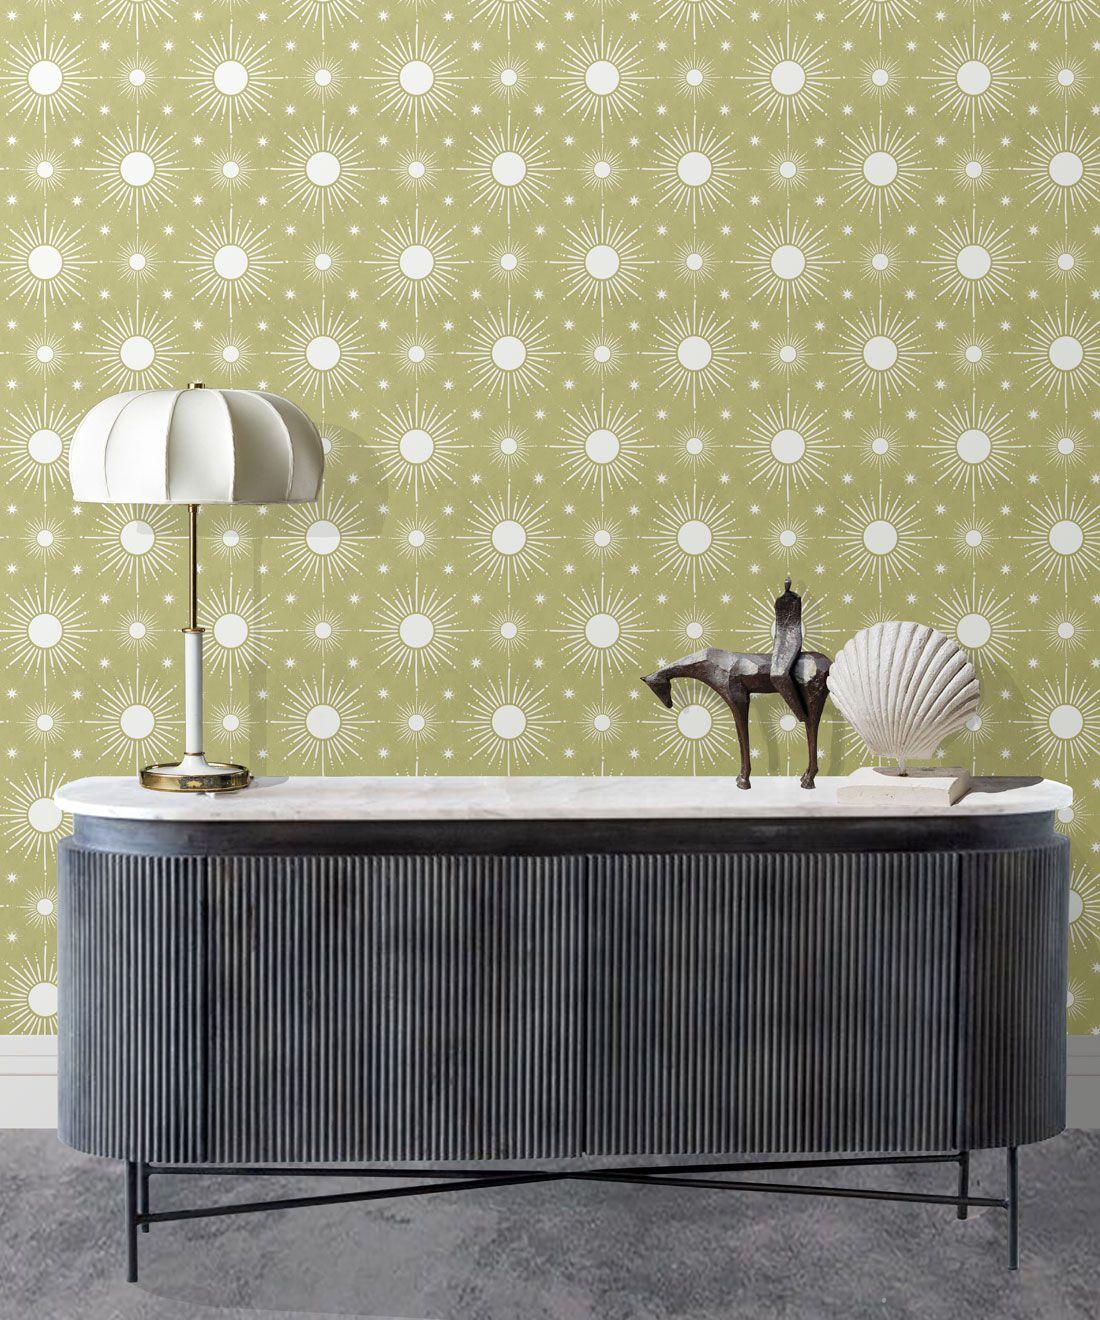 Sun Light Star Bright Wallpaper • Chartreuse • Insitu